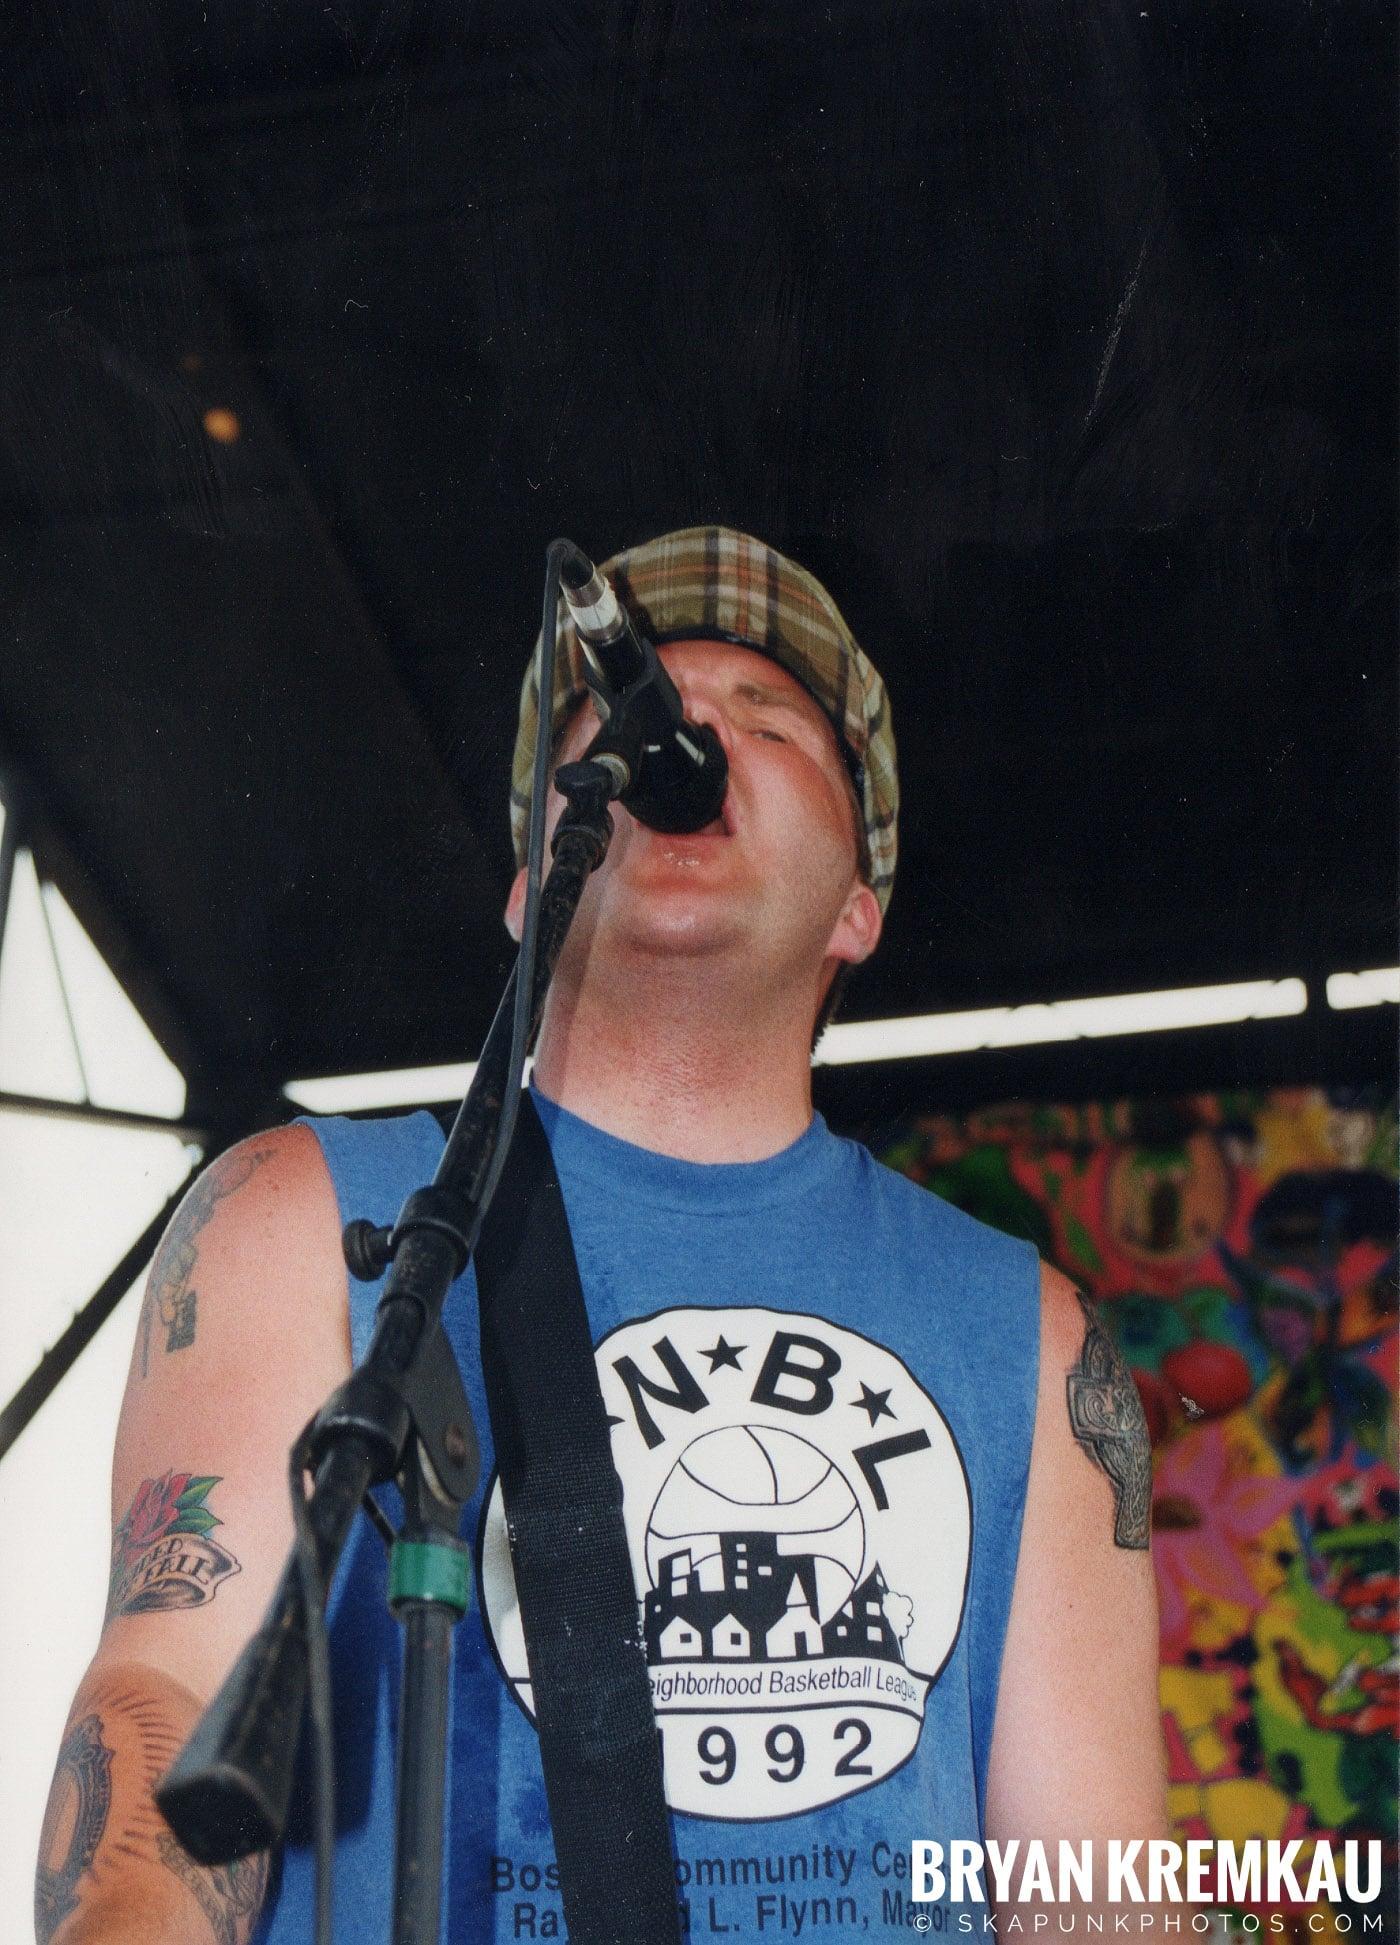 The Dropkick Murphys @ Vans Warped Tour, Randall's Island, NYC - 7.16.99 (11)